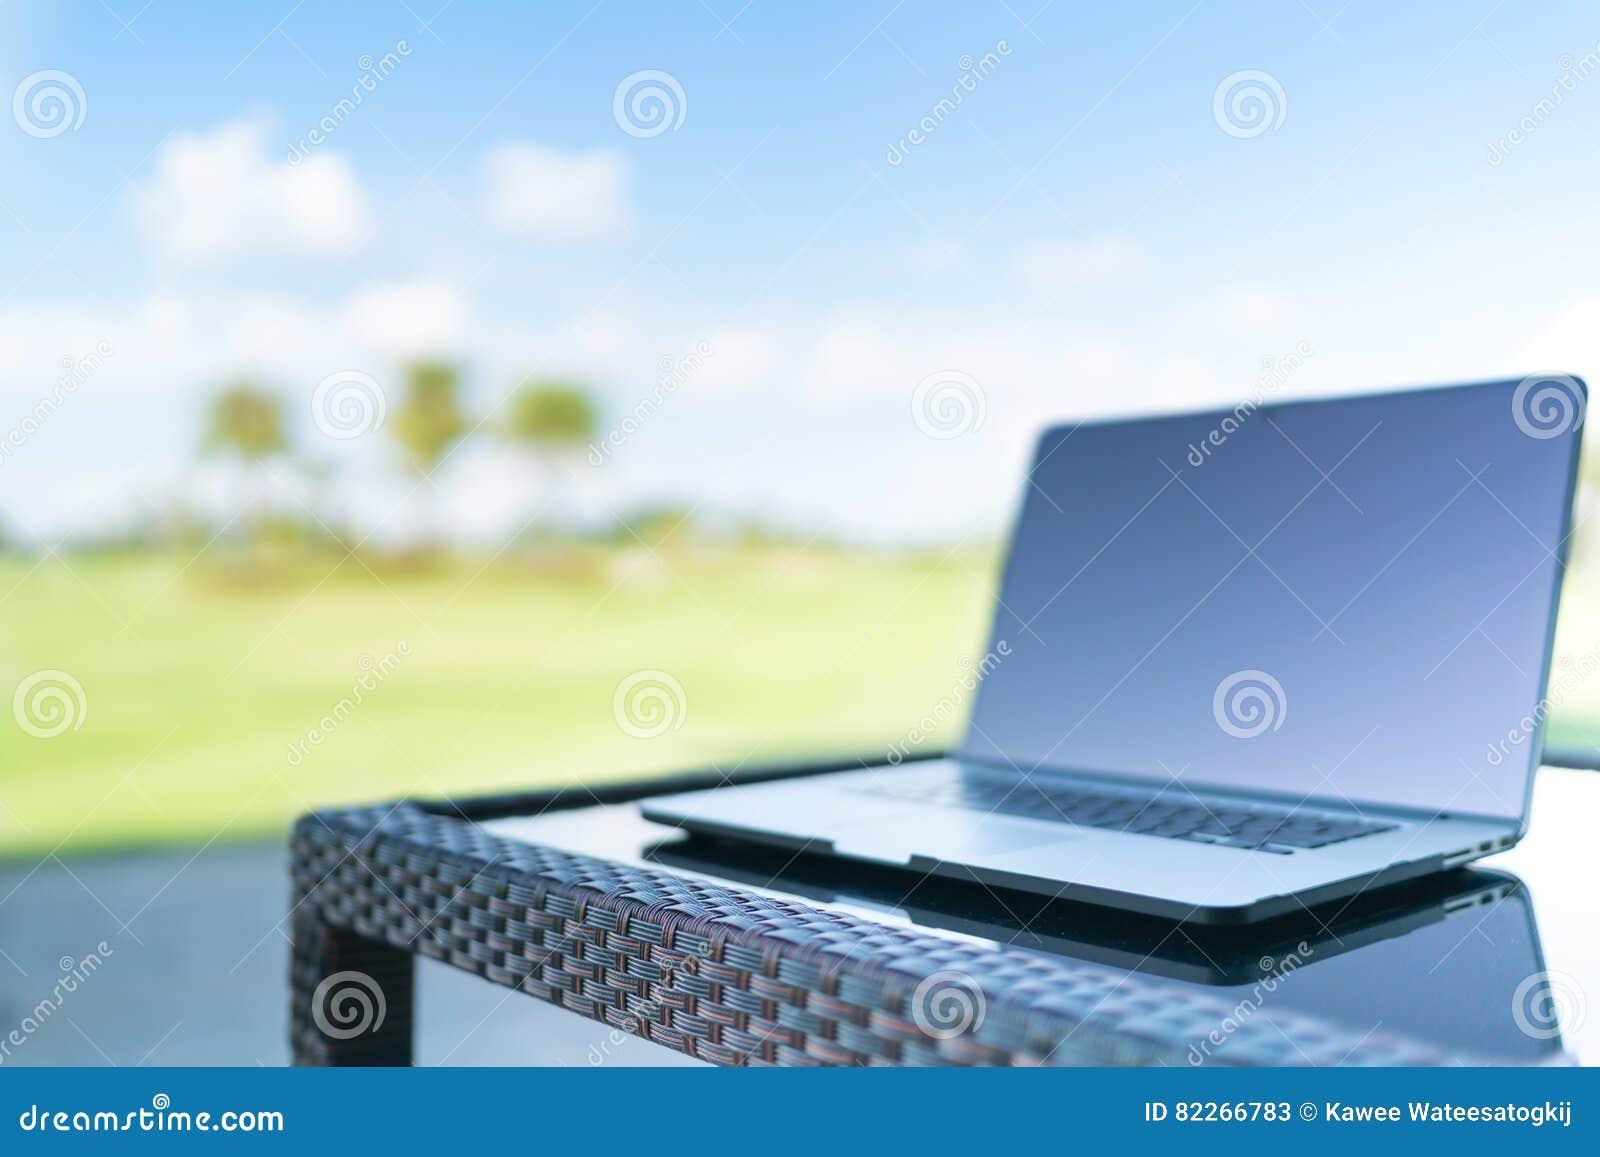 Lap-top στο υπόβαθρο θαμπάδων γηπέδων του γκολφ με το διάστημα, την επιχείρηση ή την εργασία αντιγράφων από οπουδήποτε την έννοια